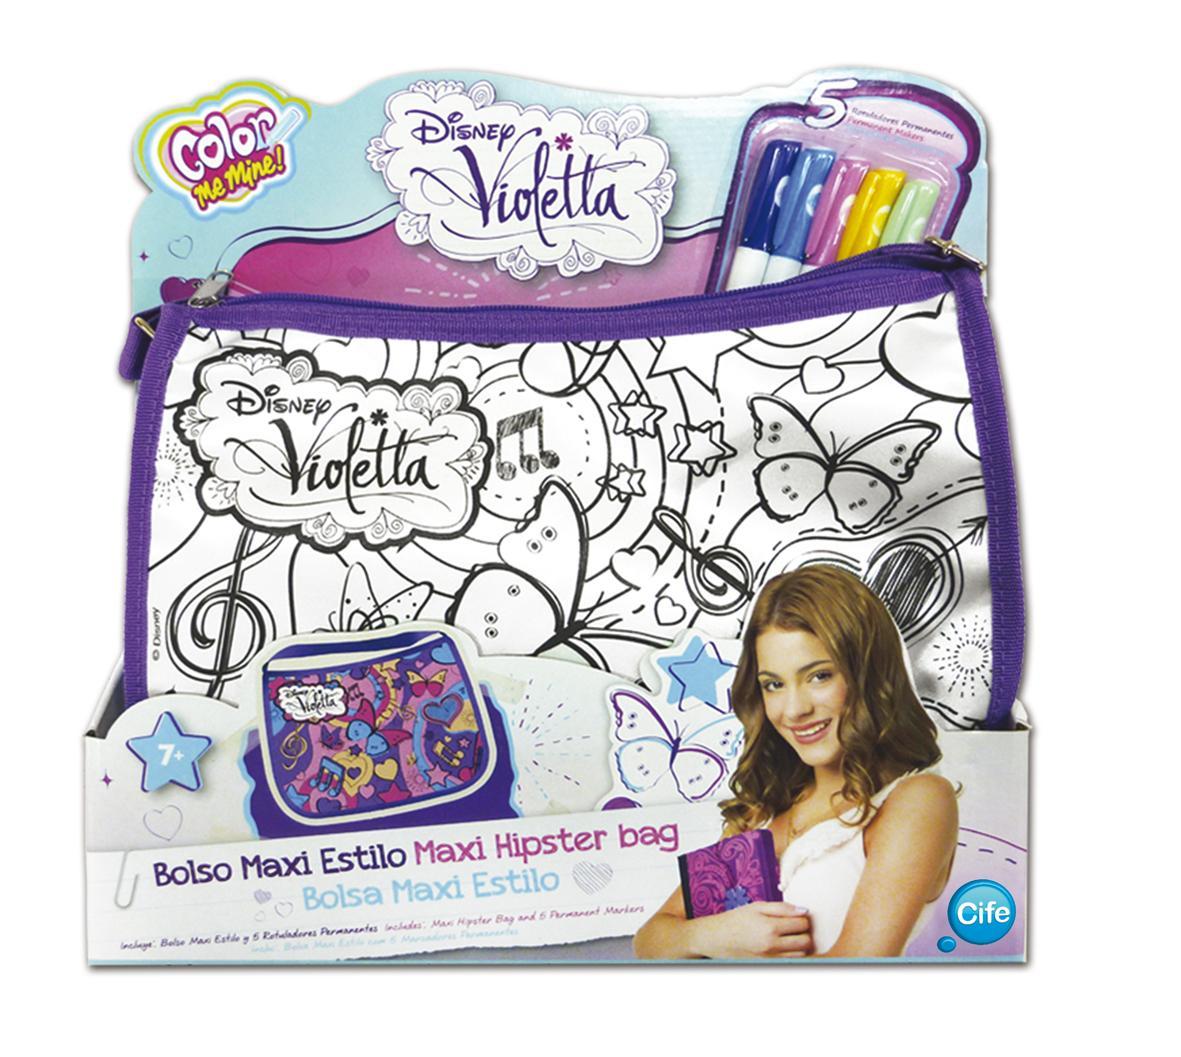 Smoby 86103 loisirs cr atifs sac tendance xl violetta color me mine mod le al atoire - Sac a colorier violetta ...